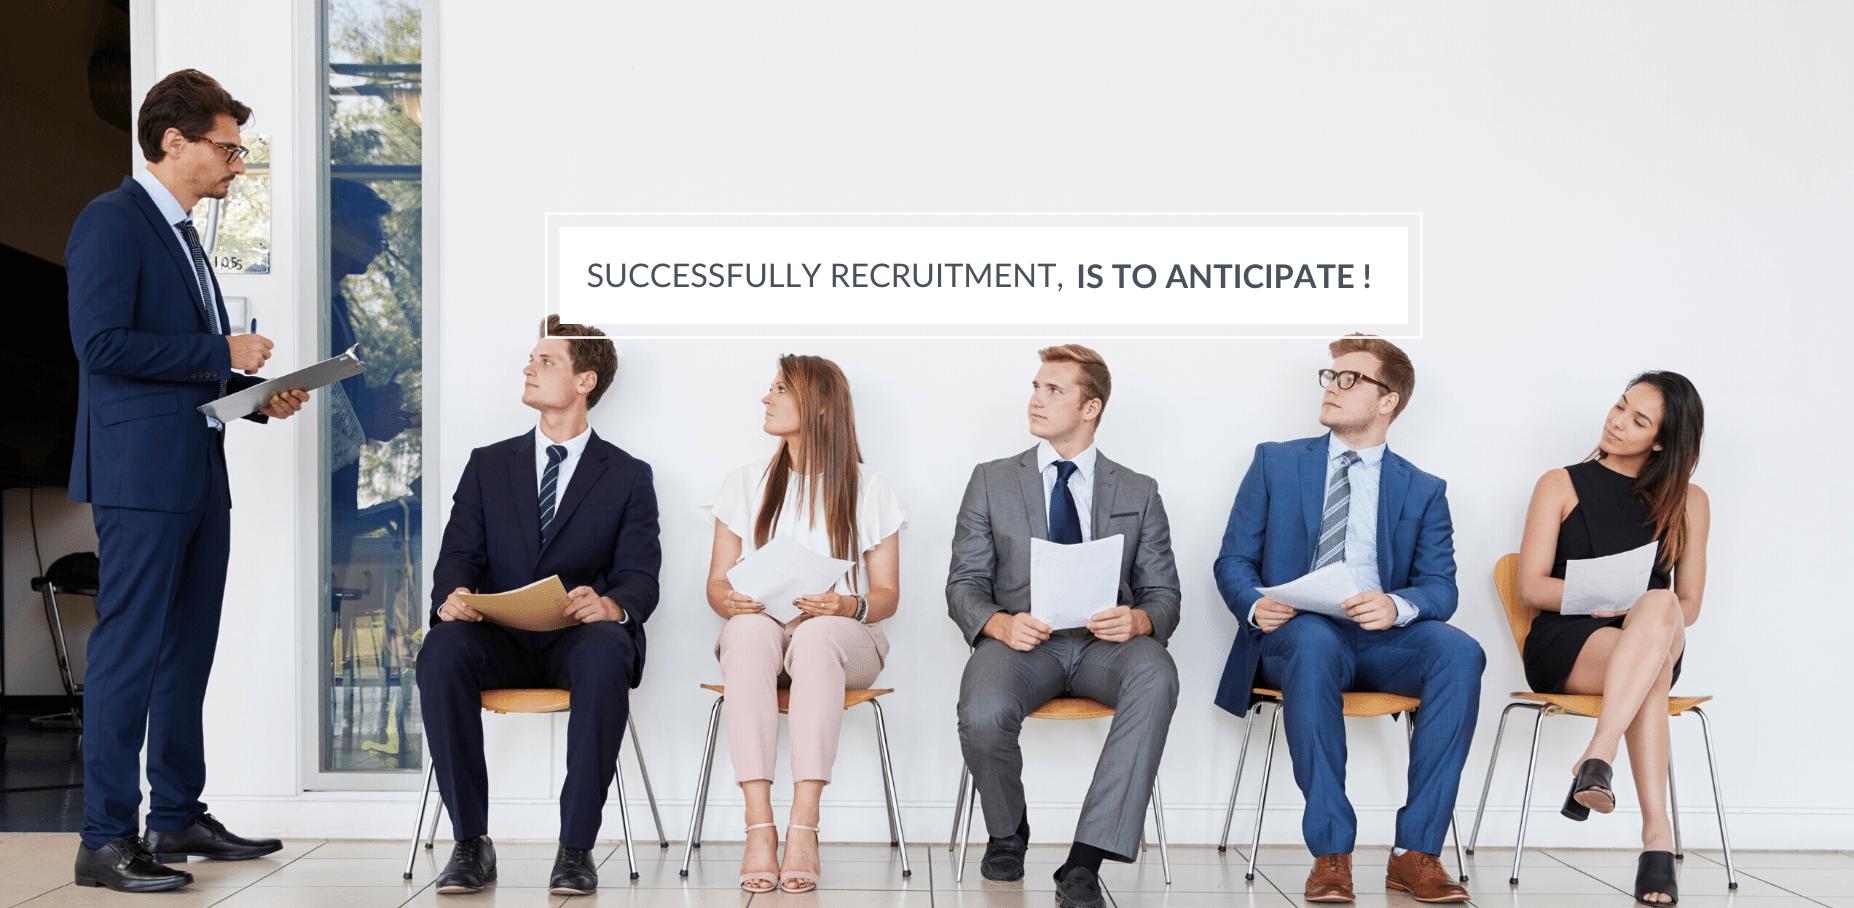 Successfully recruitment is to anticipate